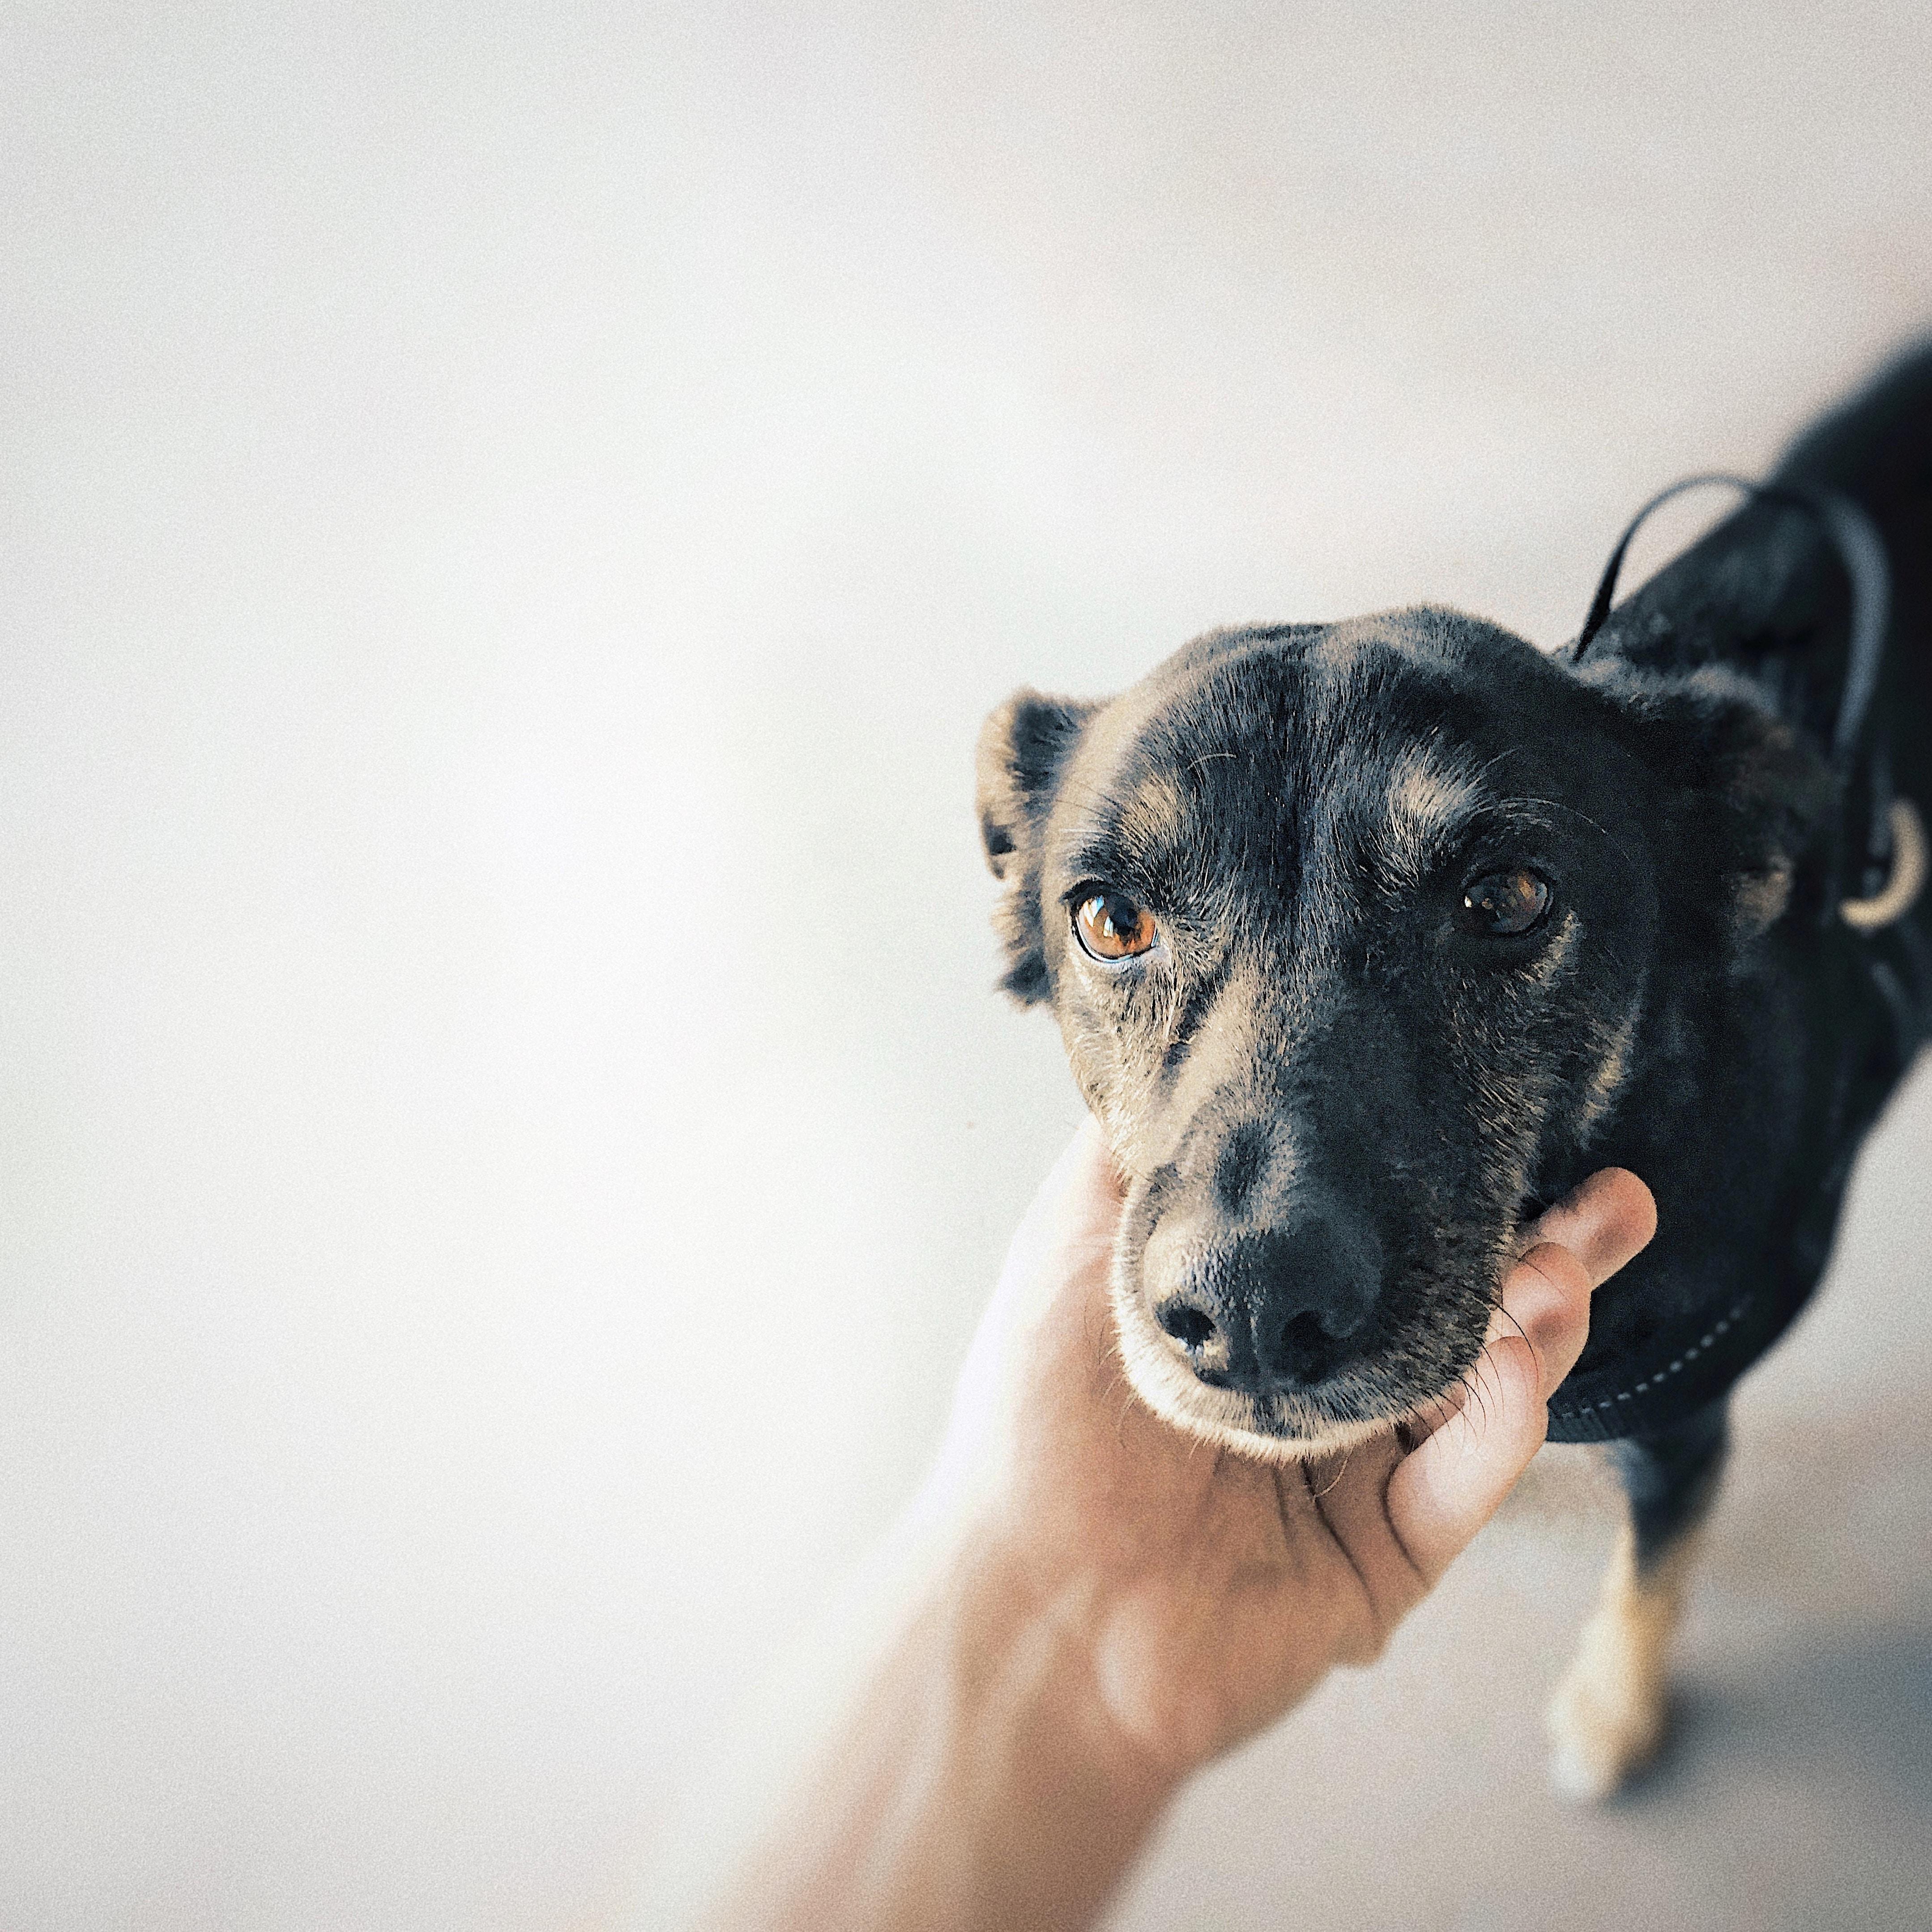 person holding short-coated black dog